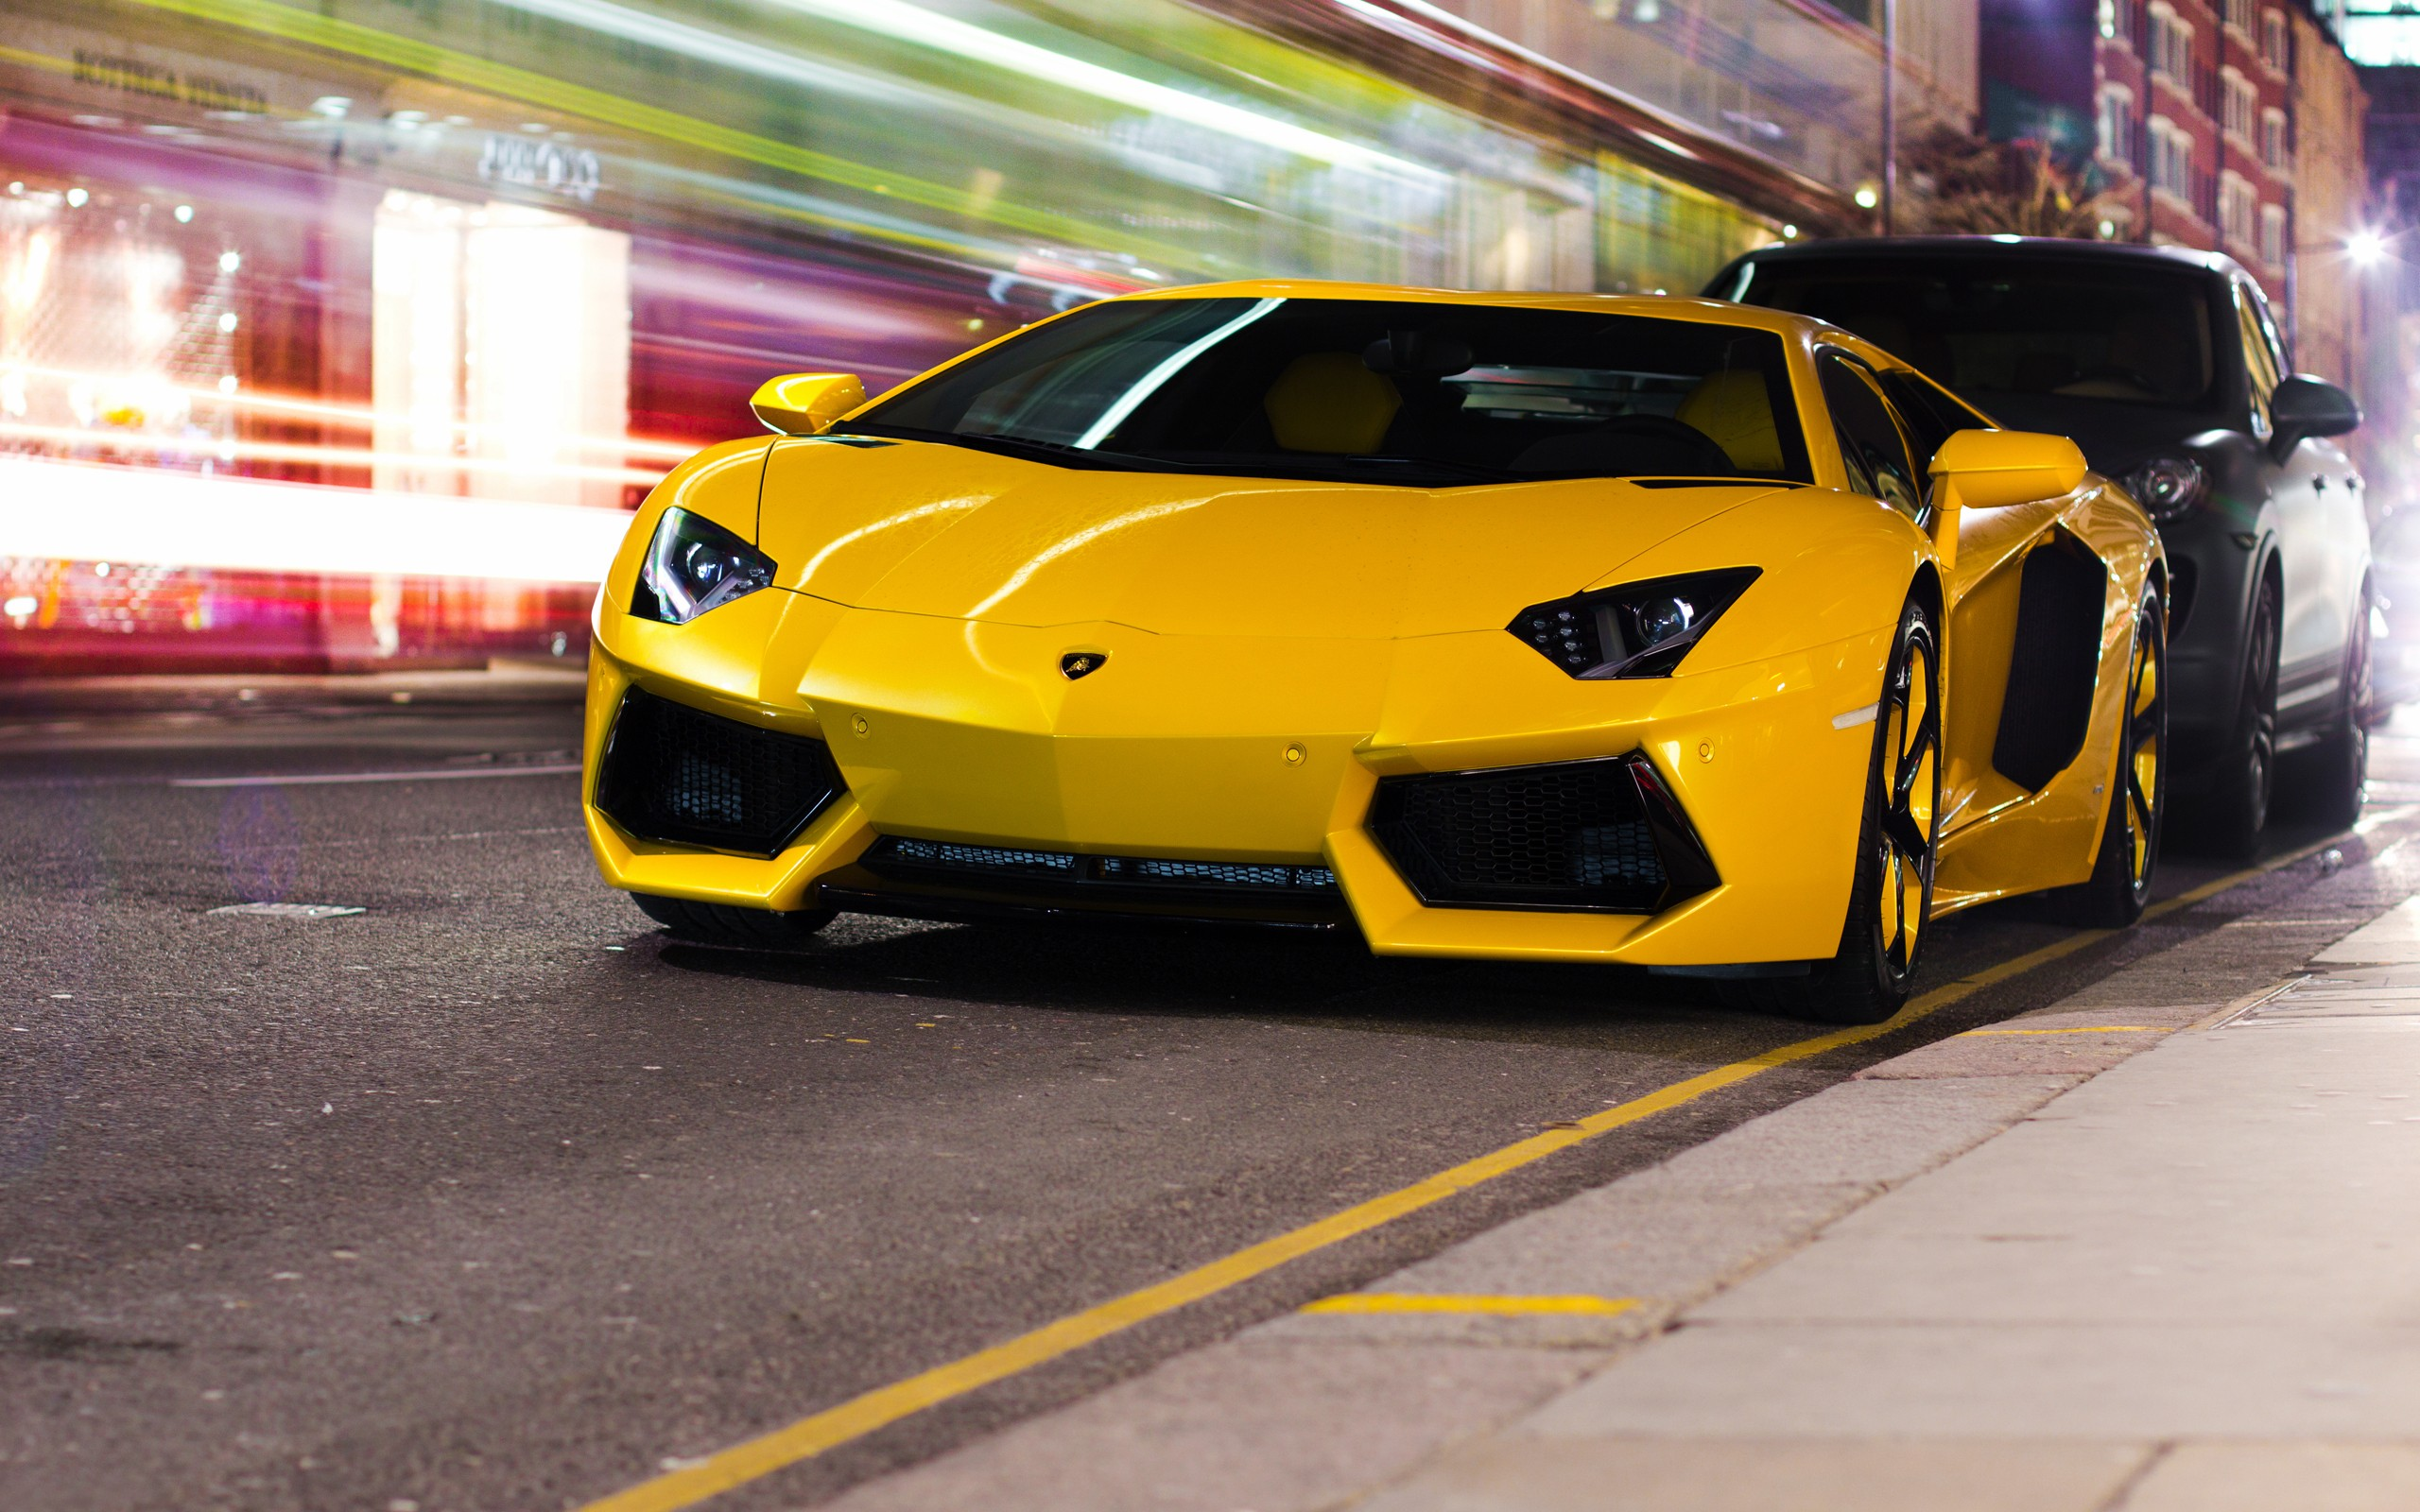 Black And Yellow Cool Cars Desktop Wallpaper Hdblackwallpapercom - Cool yellow cars